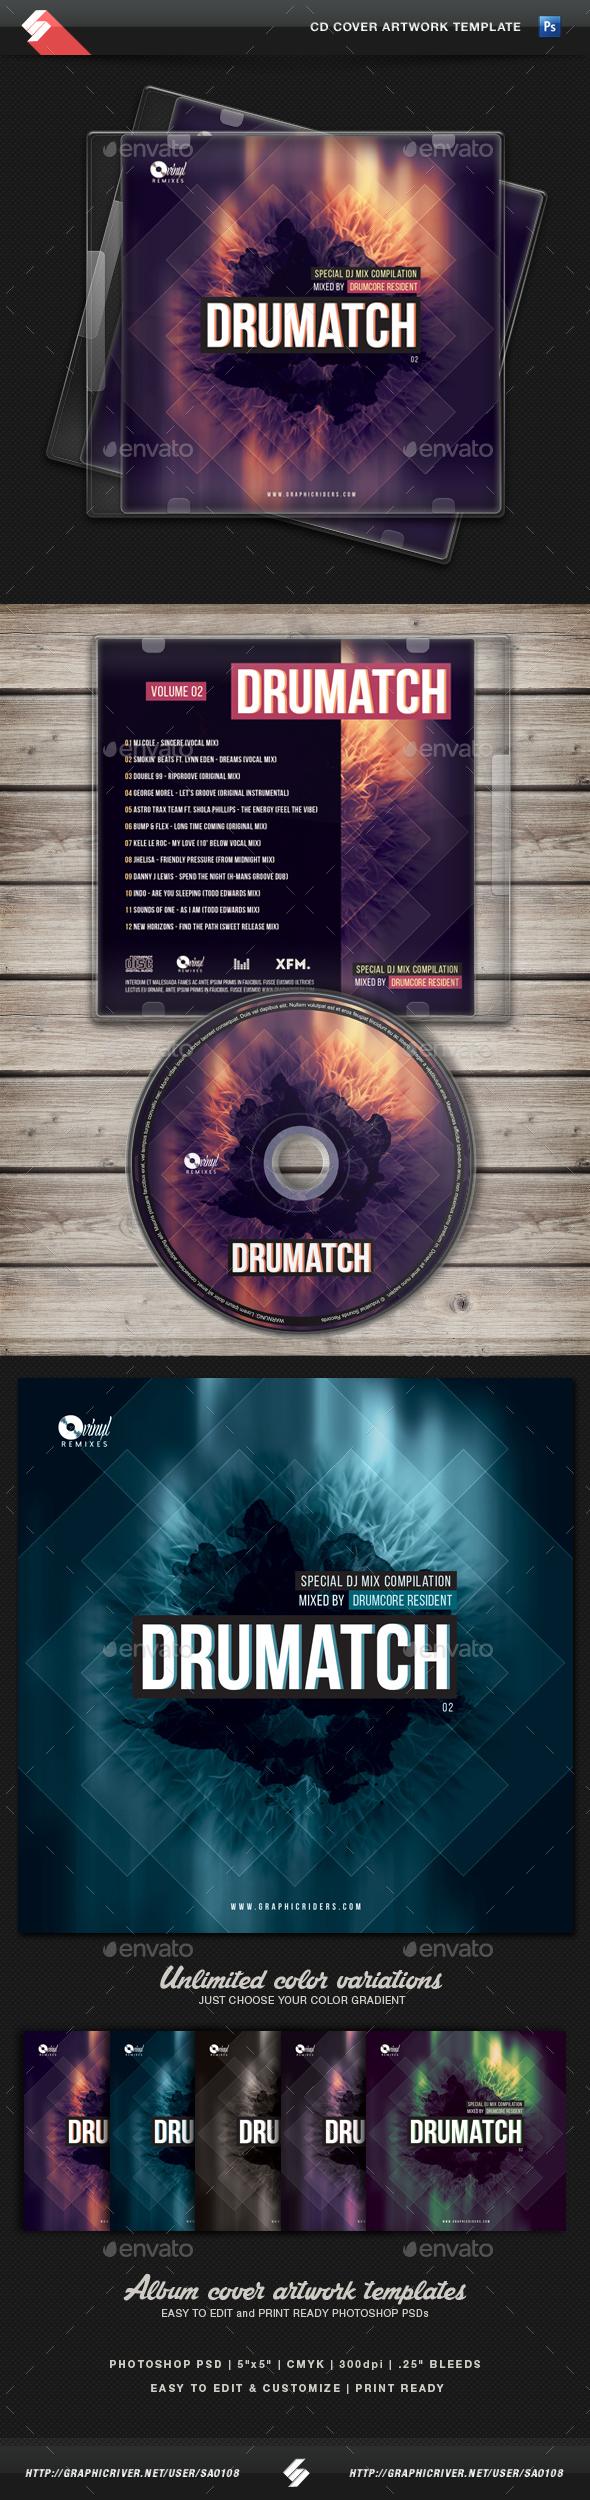 Drumatch vol.2 - CD Cover Artwork Template - CD & DVD Artwork Print Templates